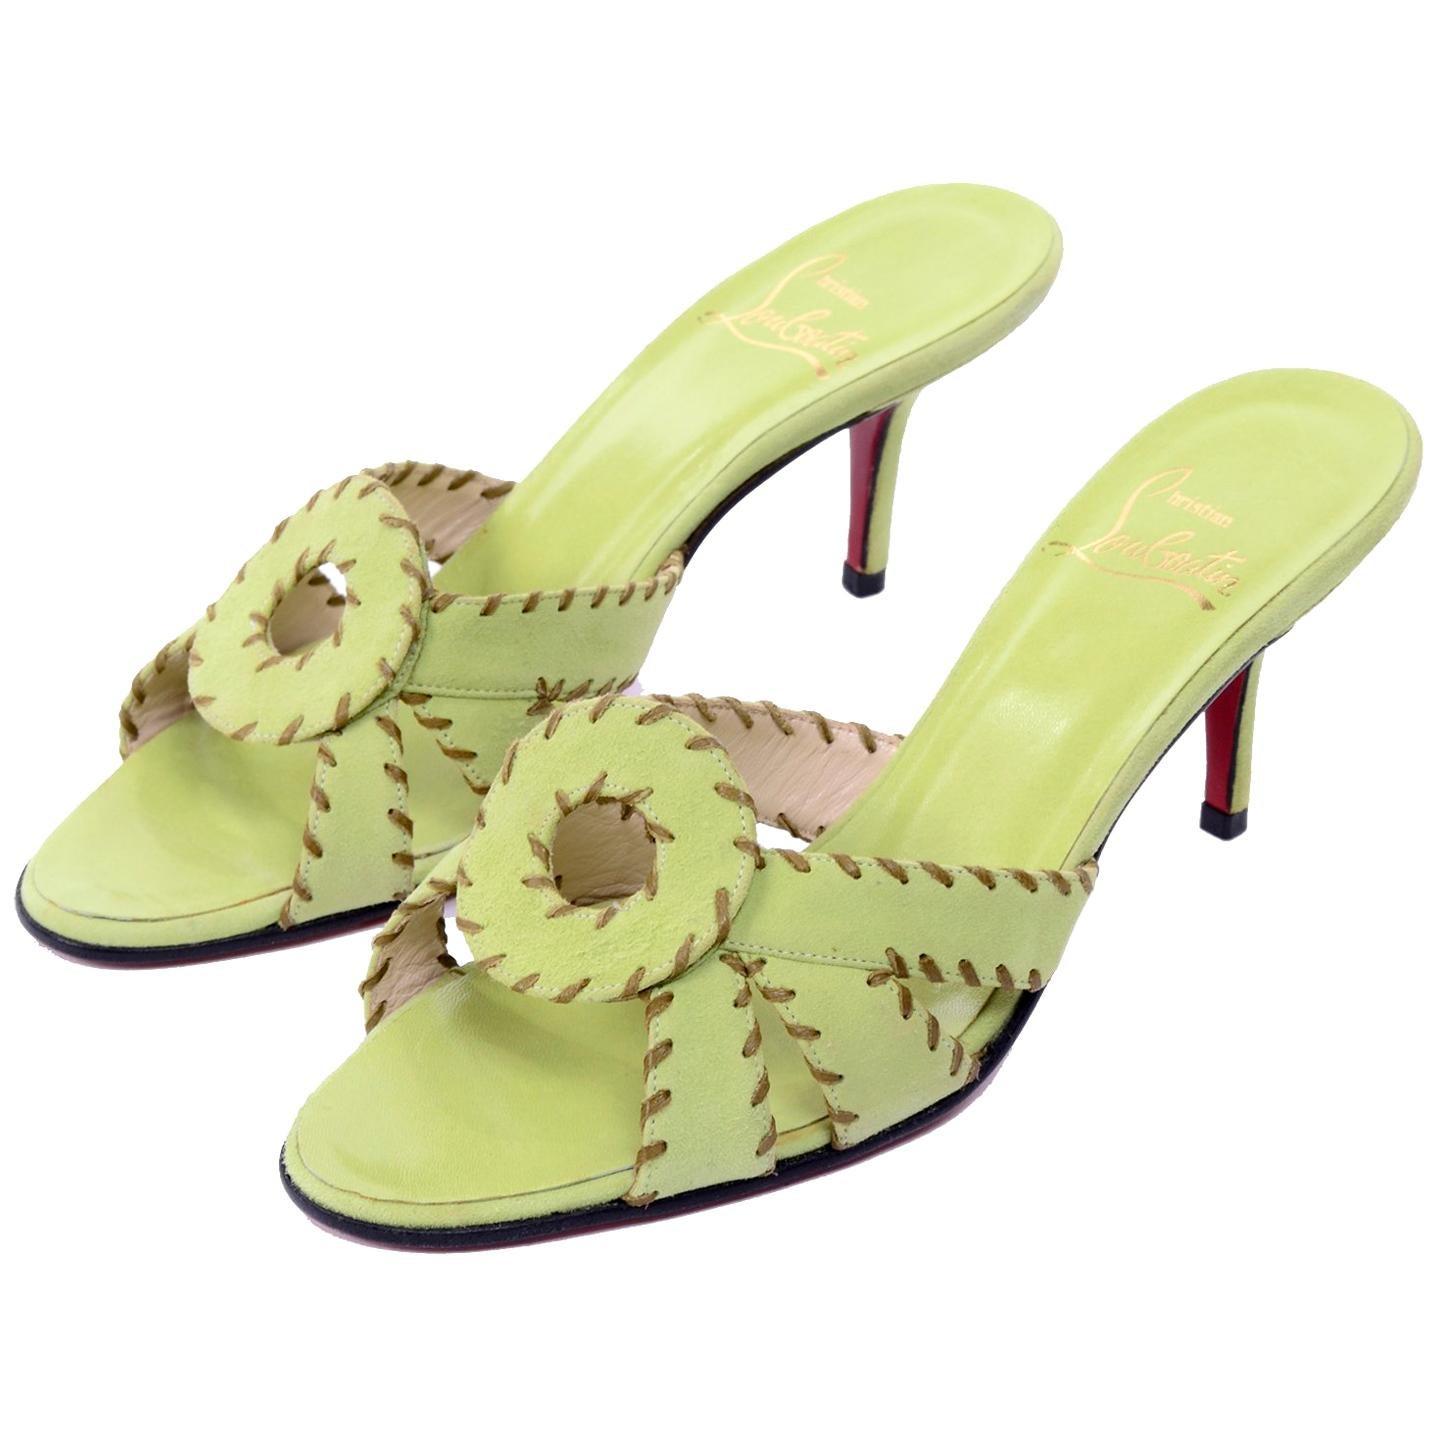 Christian Louboutin Lime Green Open Toe Sandal Shoes w/ Heels in Size 38